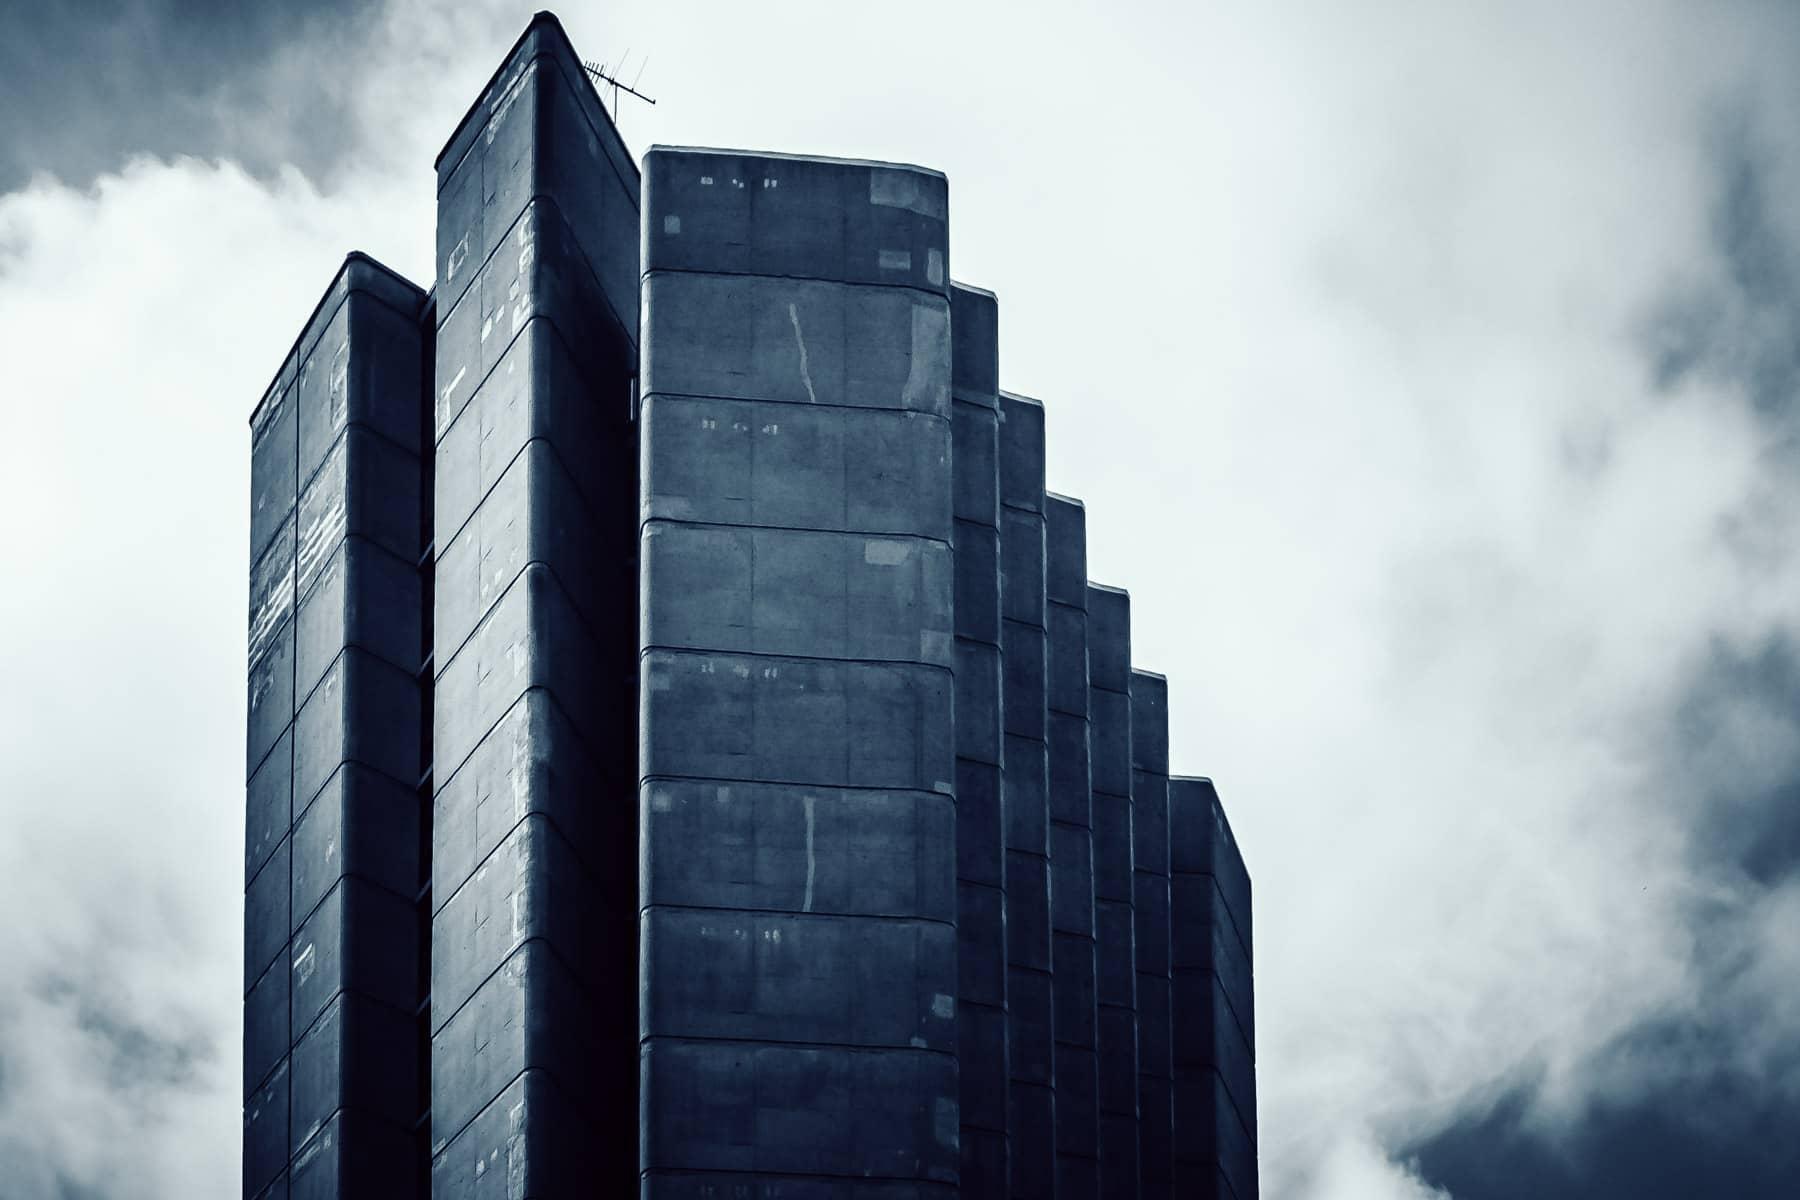 Detail of the upper floors of a high rise building on the campus of the Université de Montréal.